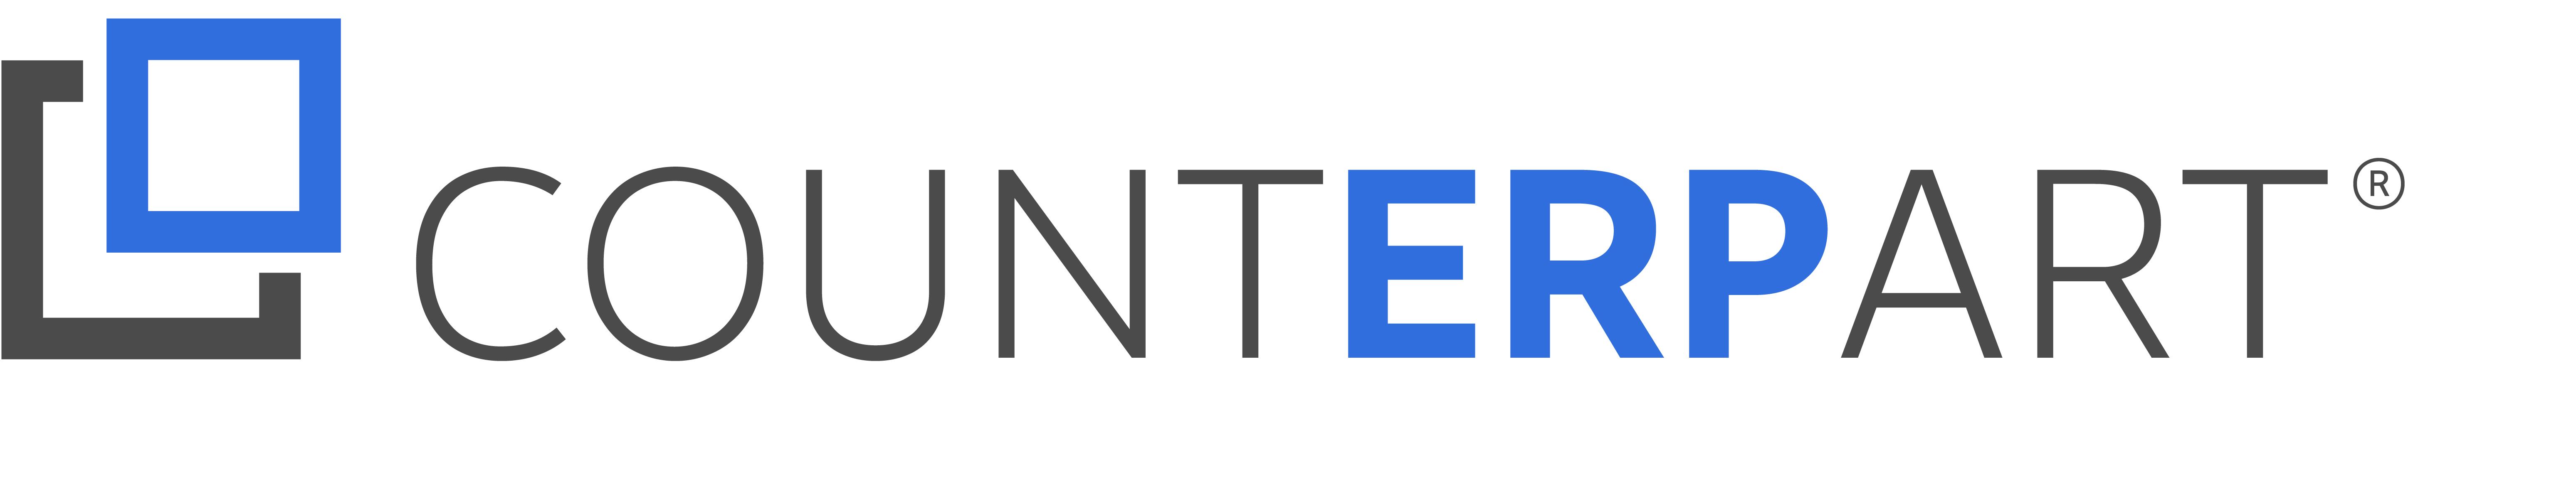 ETO ERP Procurement App in COUNTERPART Proves Critical